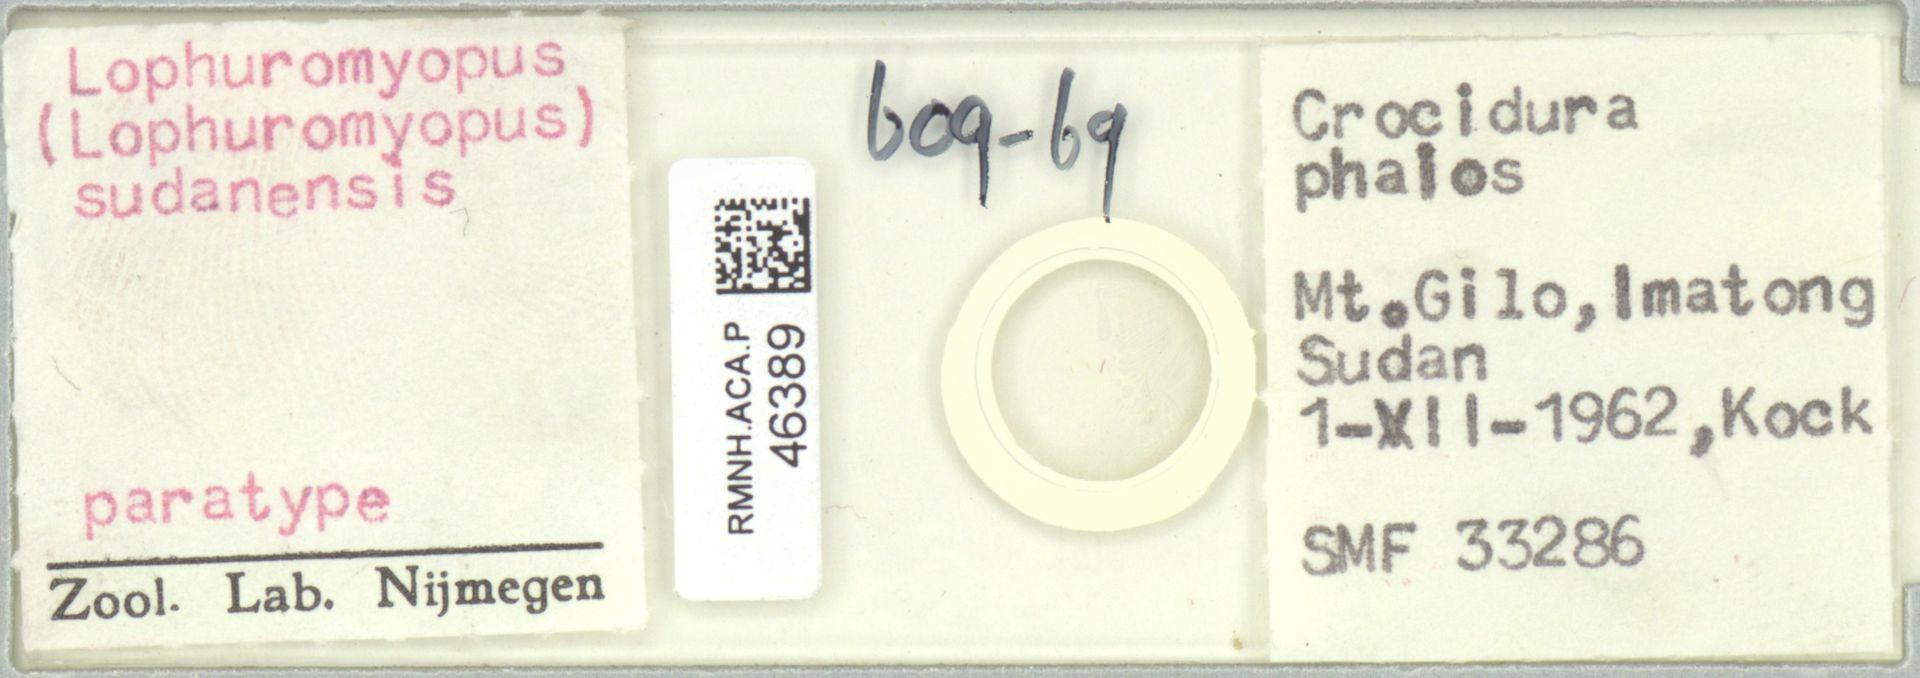 RMNH.ACA.P.46389 | Lophuyromyopus (Lophuromyopus) sudanensis